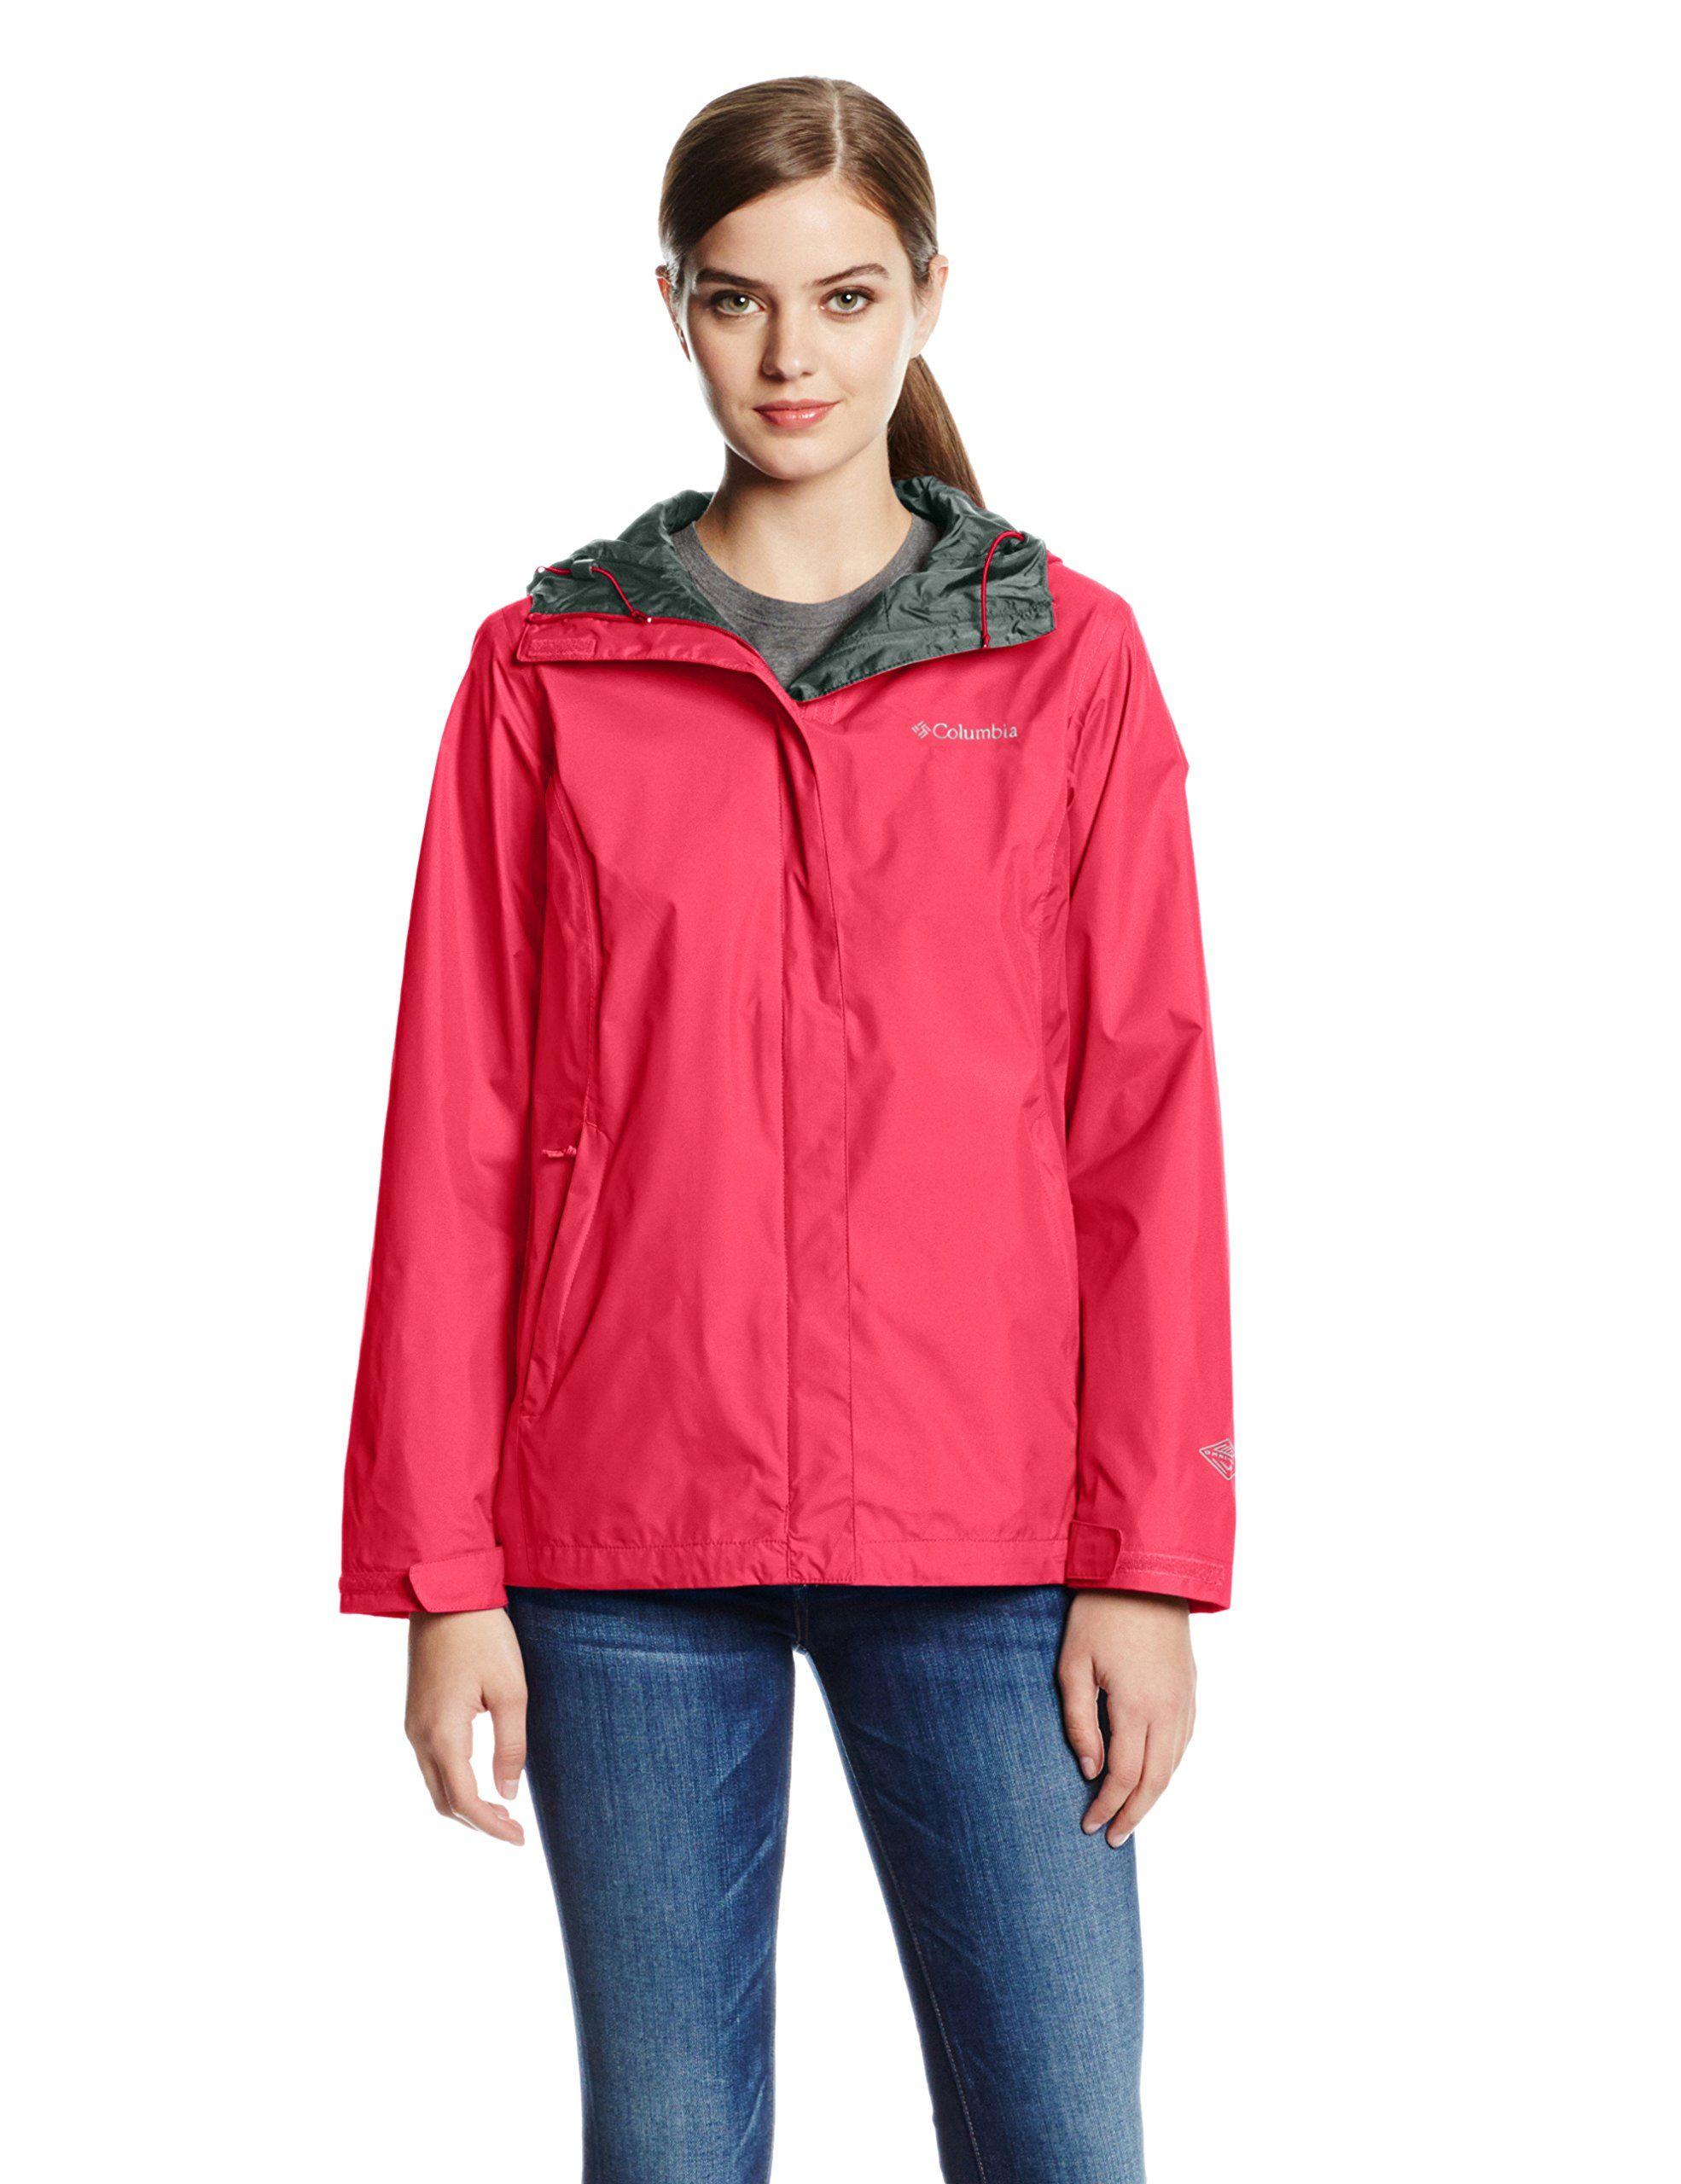 Columbia Women S Arcadia Ii Jacket Red Camellia M Omni Tech Waterproof Breathable Full Waterproof Breathable Jacket Jackets For Women Waterproof Rain Jacket